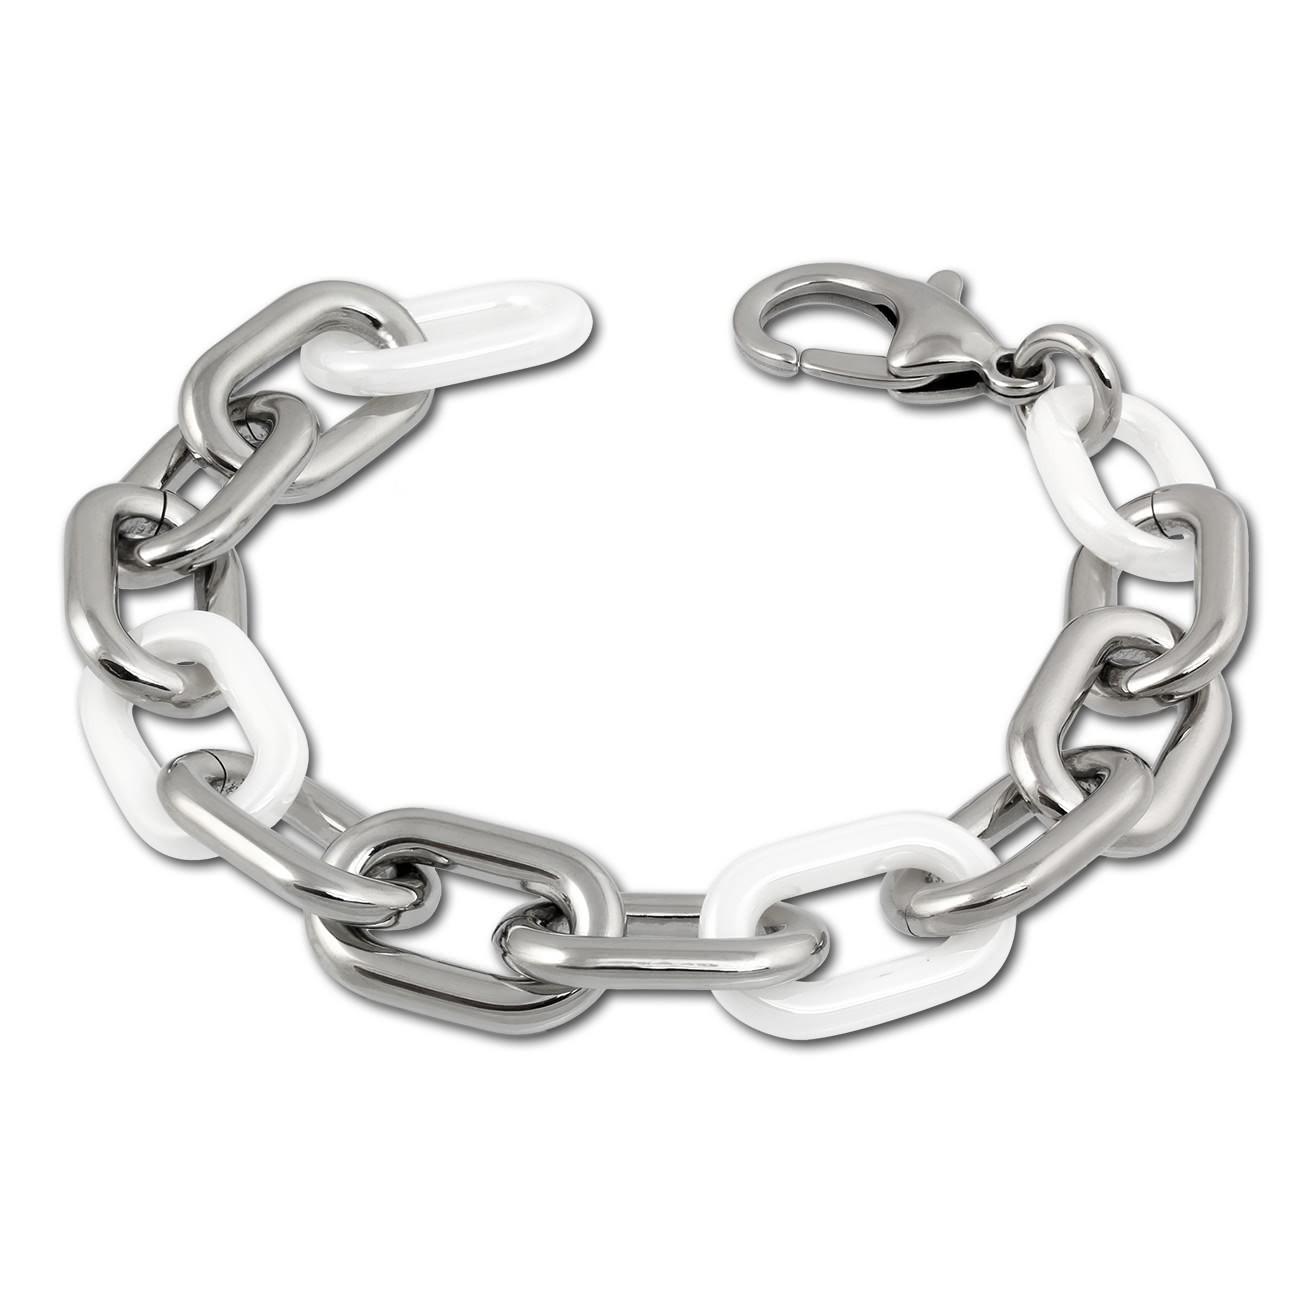 Amello Armband Keramik grobe Glieder weiß Damen Edelstahlschmuck ESAX19W1